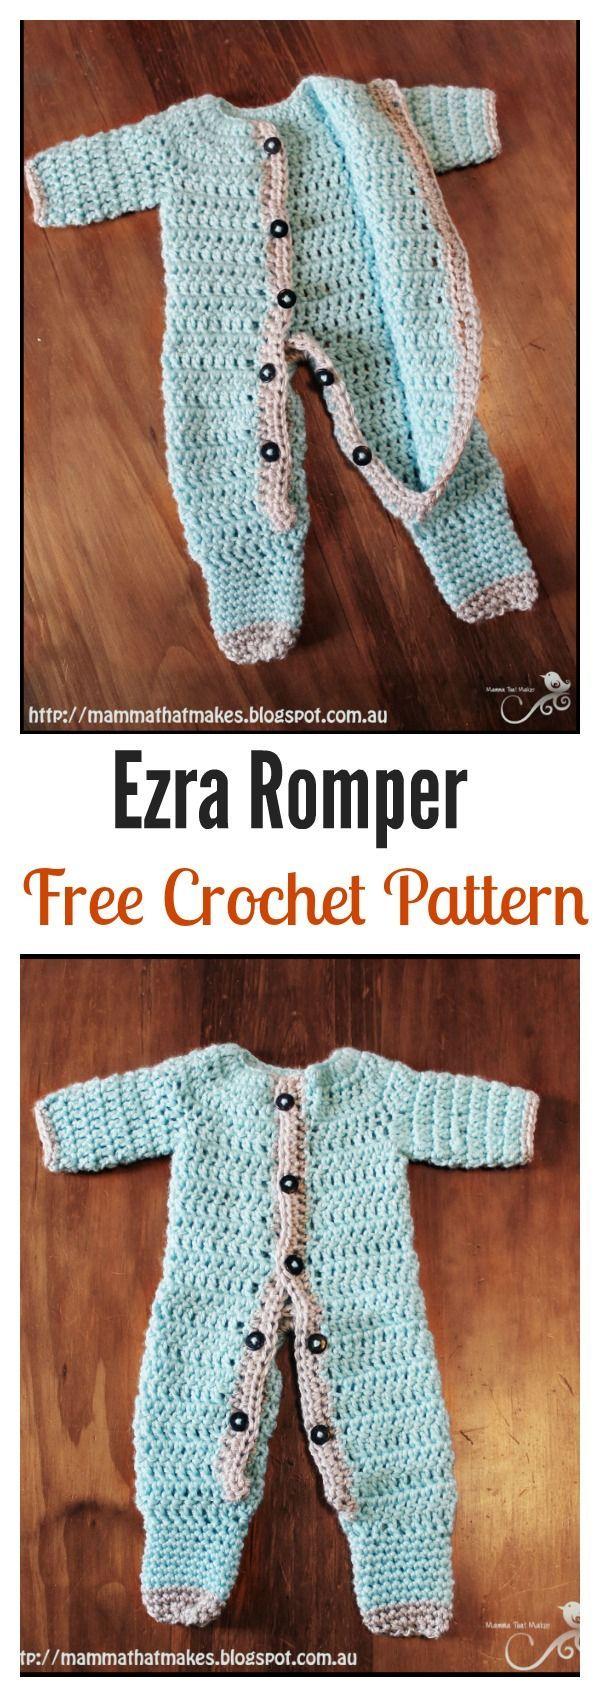 Crochet baby romper free patterns free pattern crochet and patterns crochet baby romper free patterns bankloansurffo Choice Image